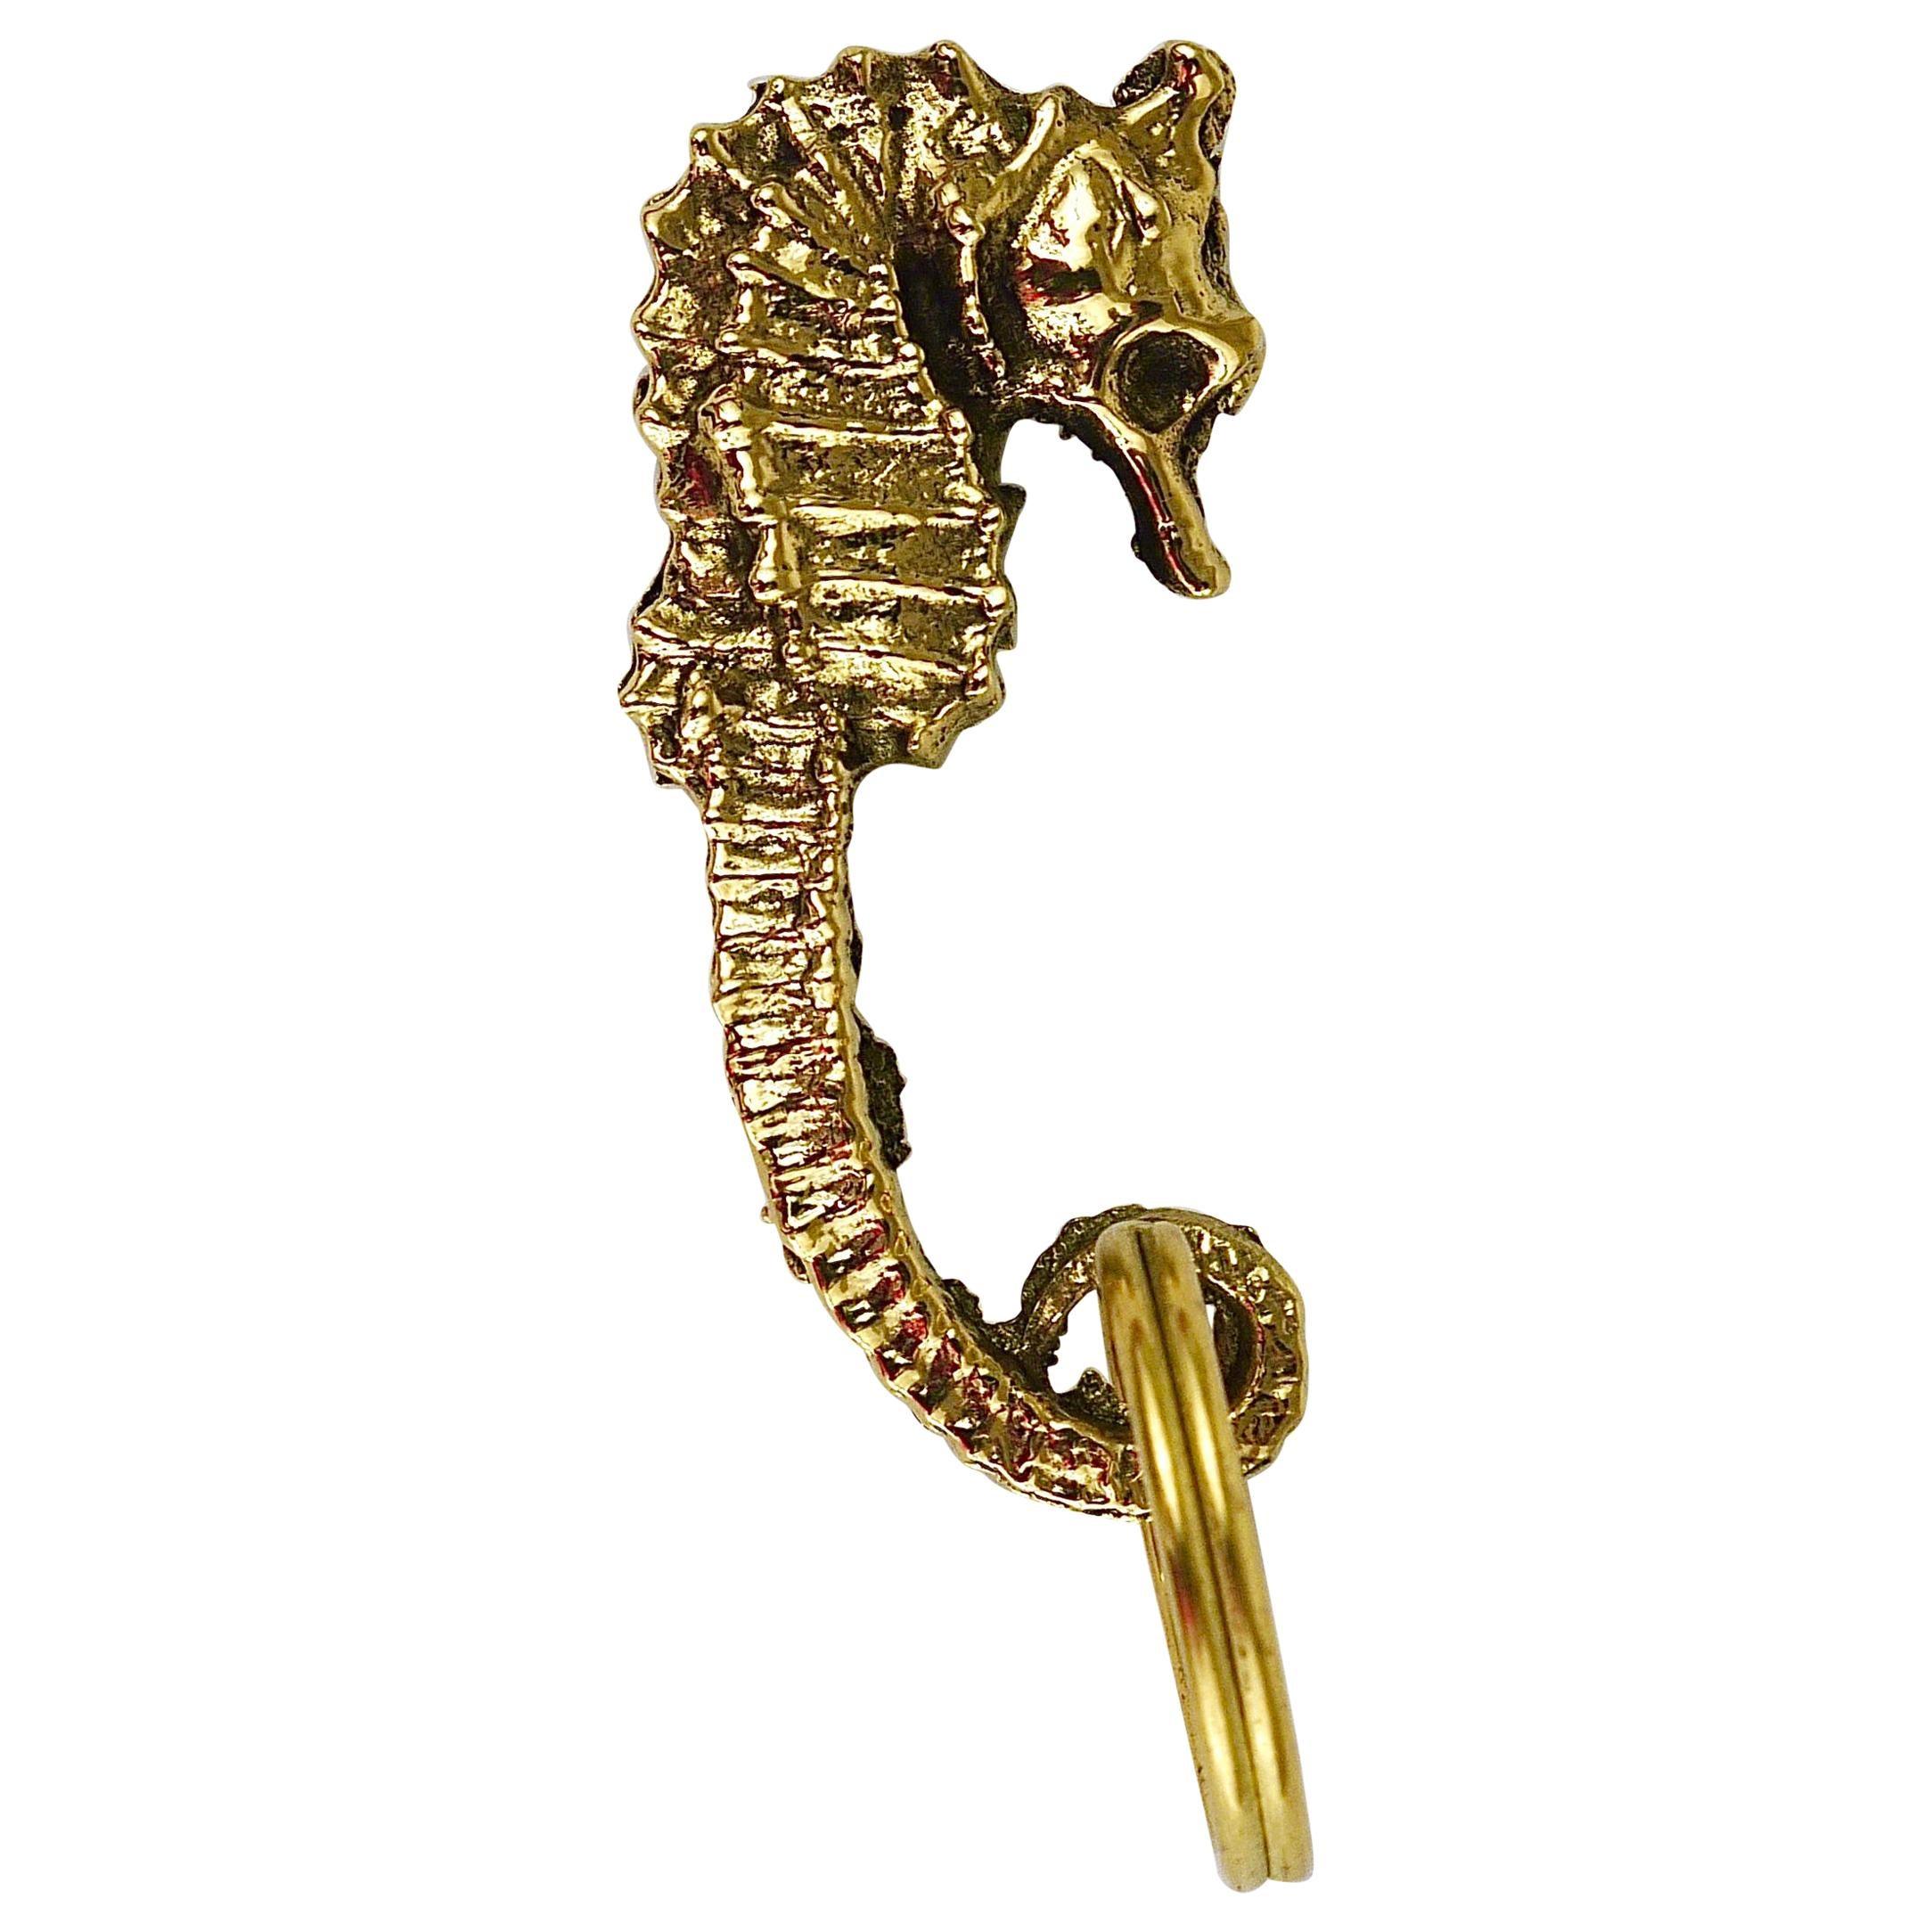 Carl Auböck Midcentury Brass Seahorse Handmade Key Ring Chain Holder